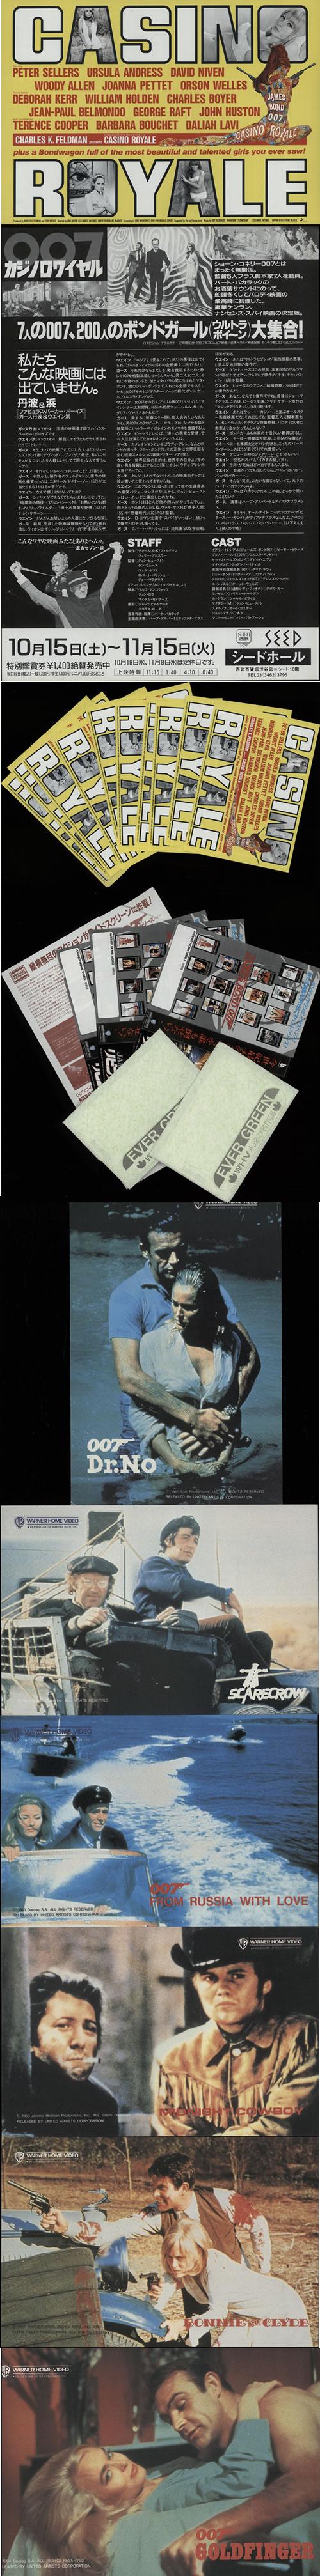 James Bond Quantity of Handbills & Postcards - 16 items handbill Japanese JBDHBQU642796